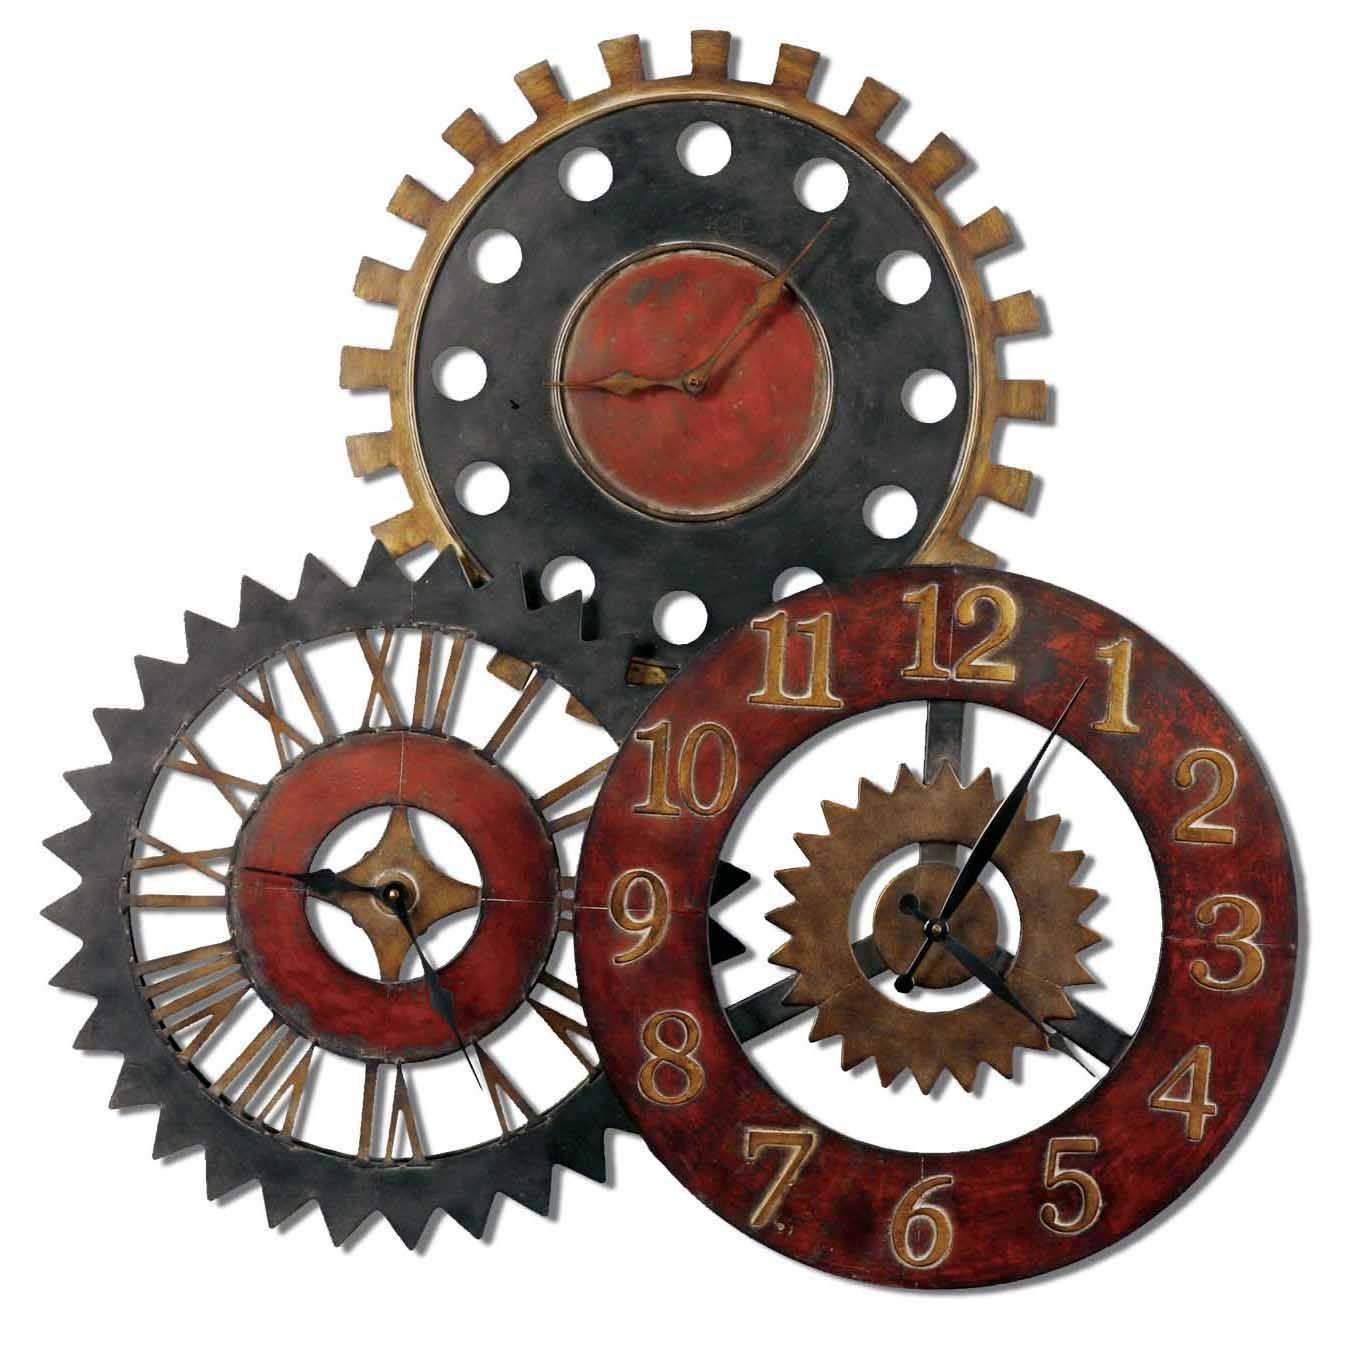 Rusty movements clock future house ideas pinterest clocks